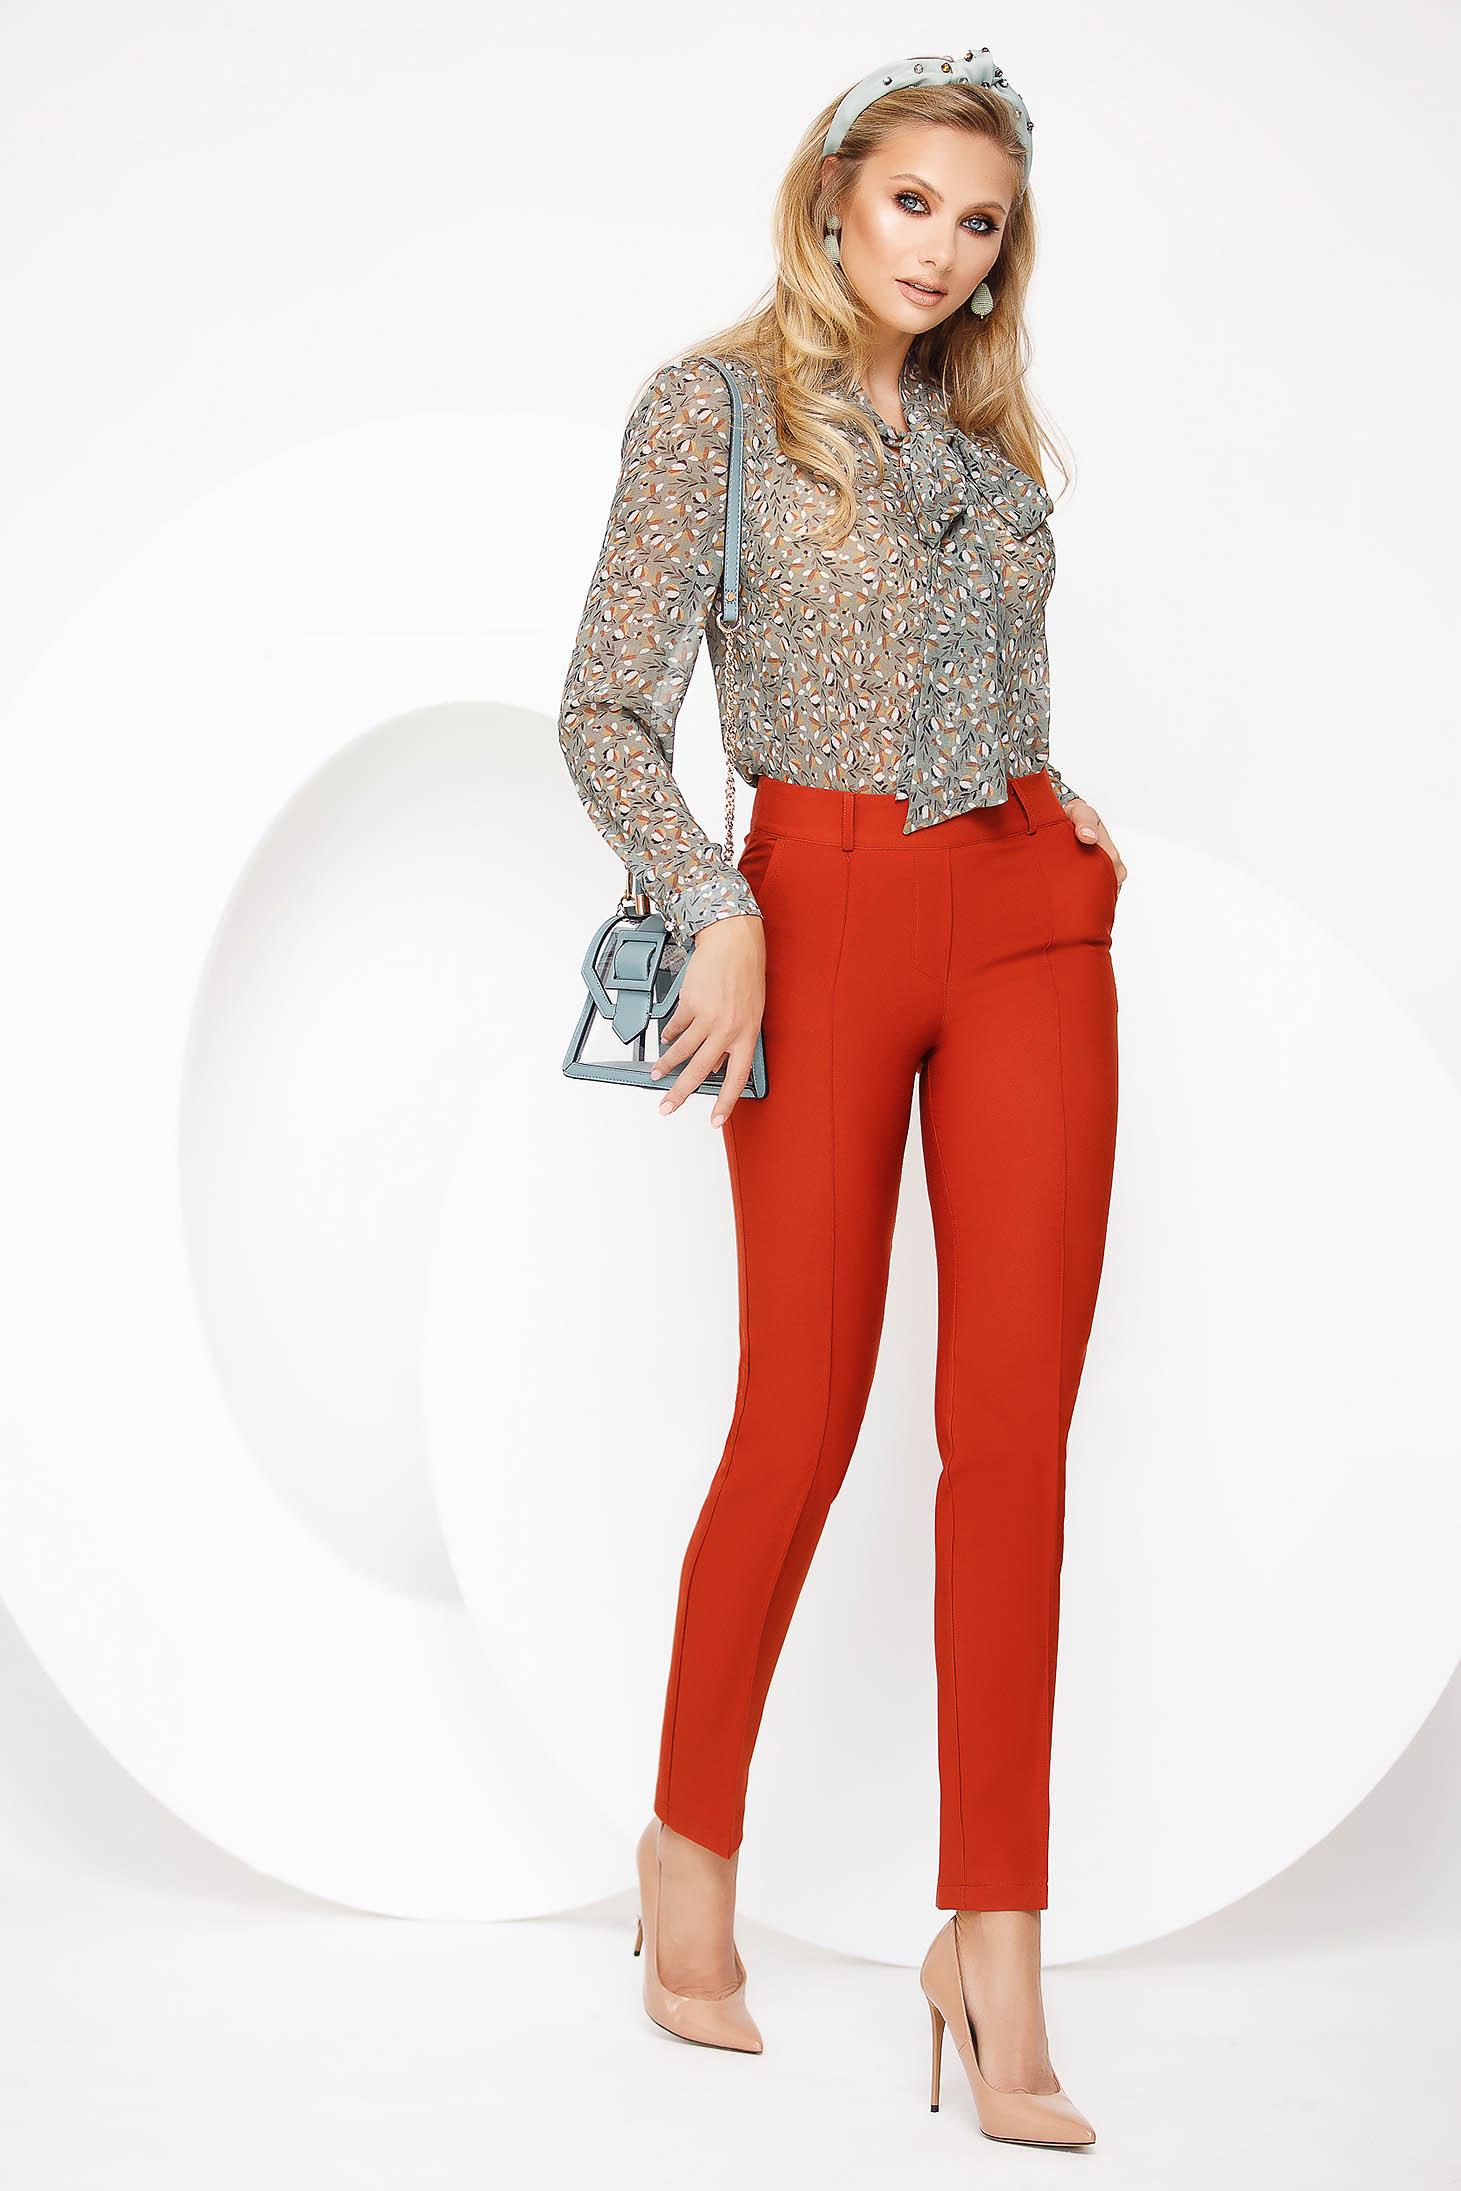 Pantaloni Fofy caramizii eleganti cu un croi drept cu talie medie cu accesoriu tip curea